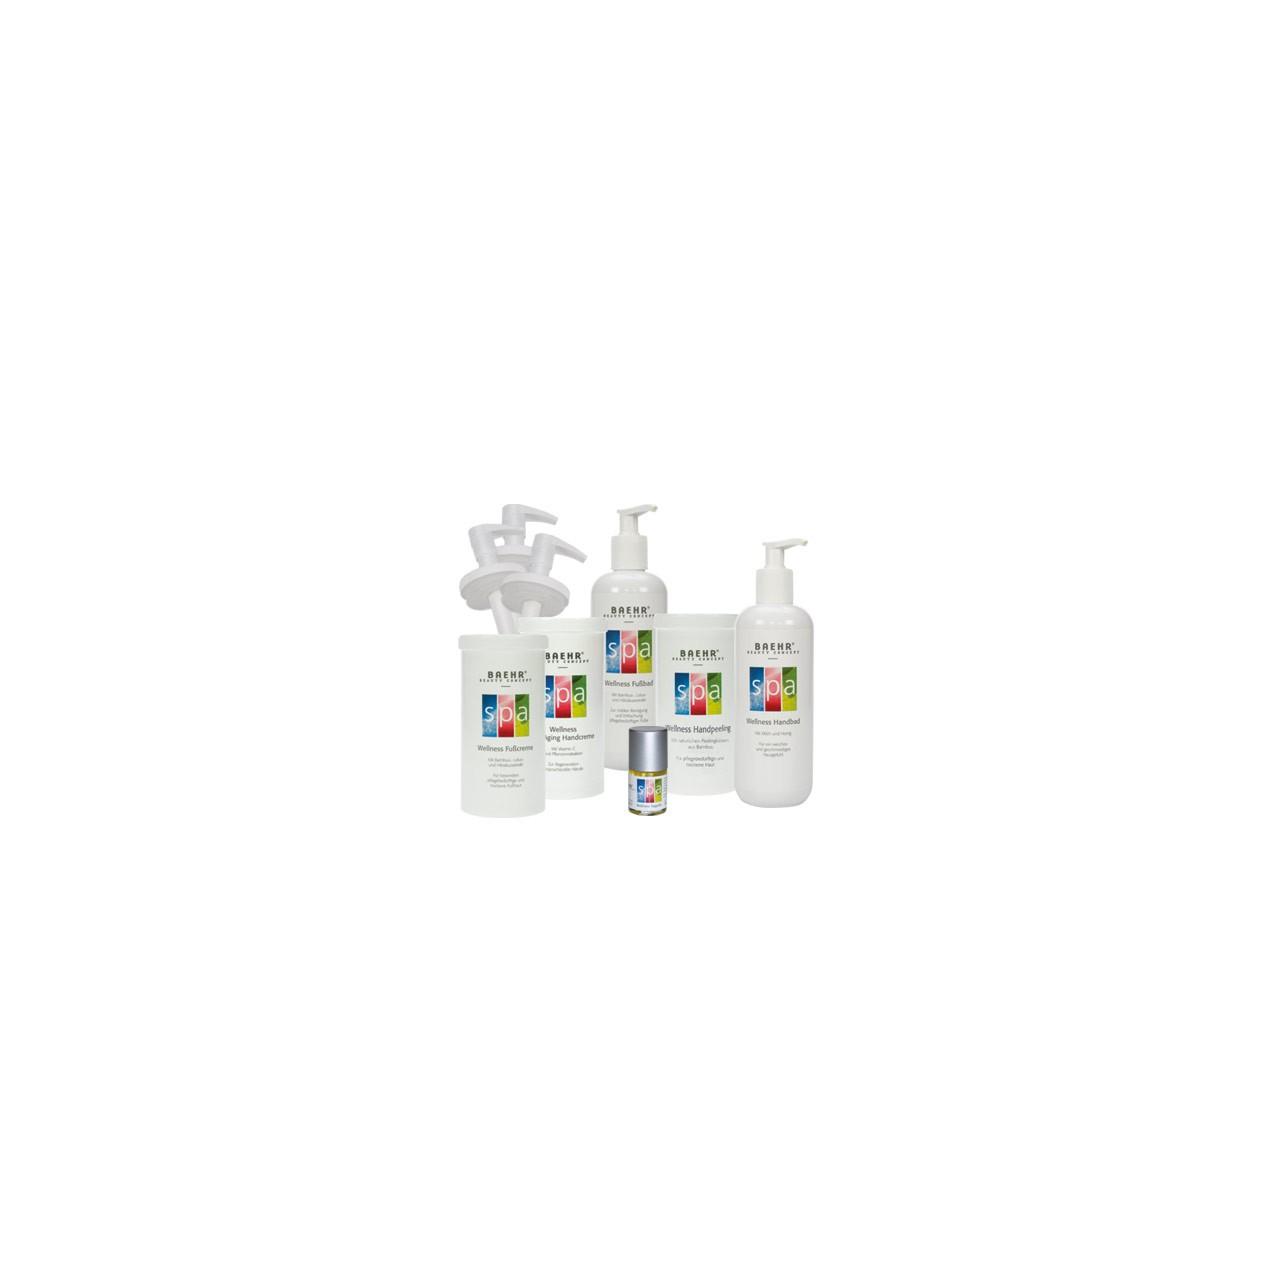 spa-wellness-set_0000080263.jpg